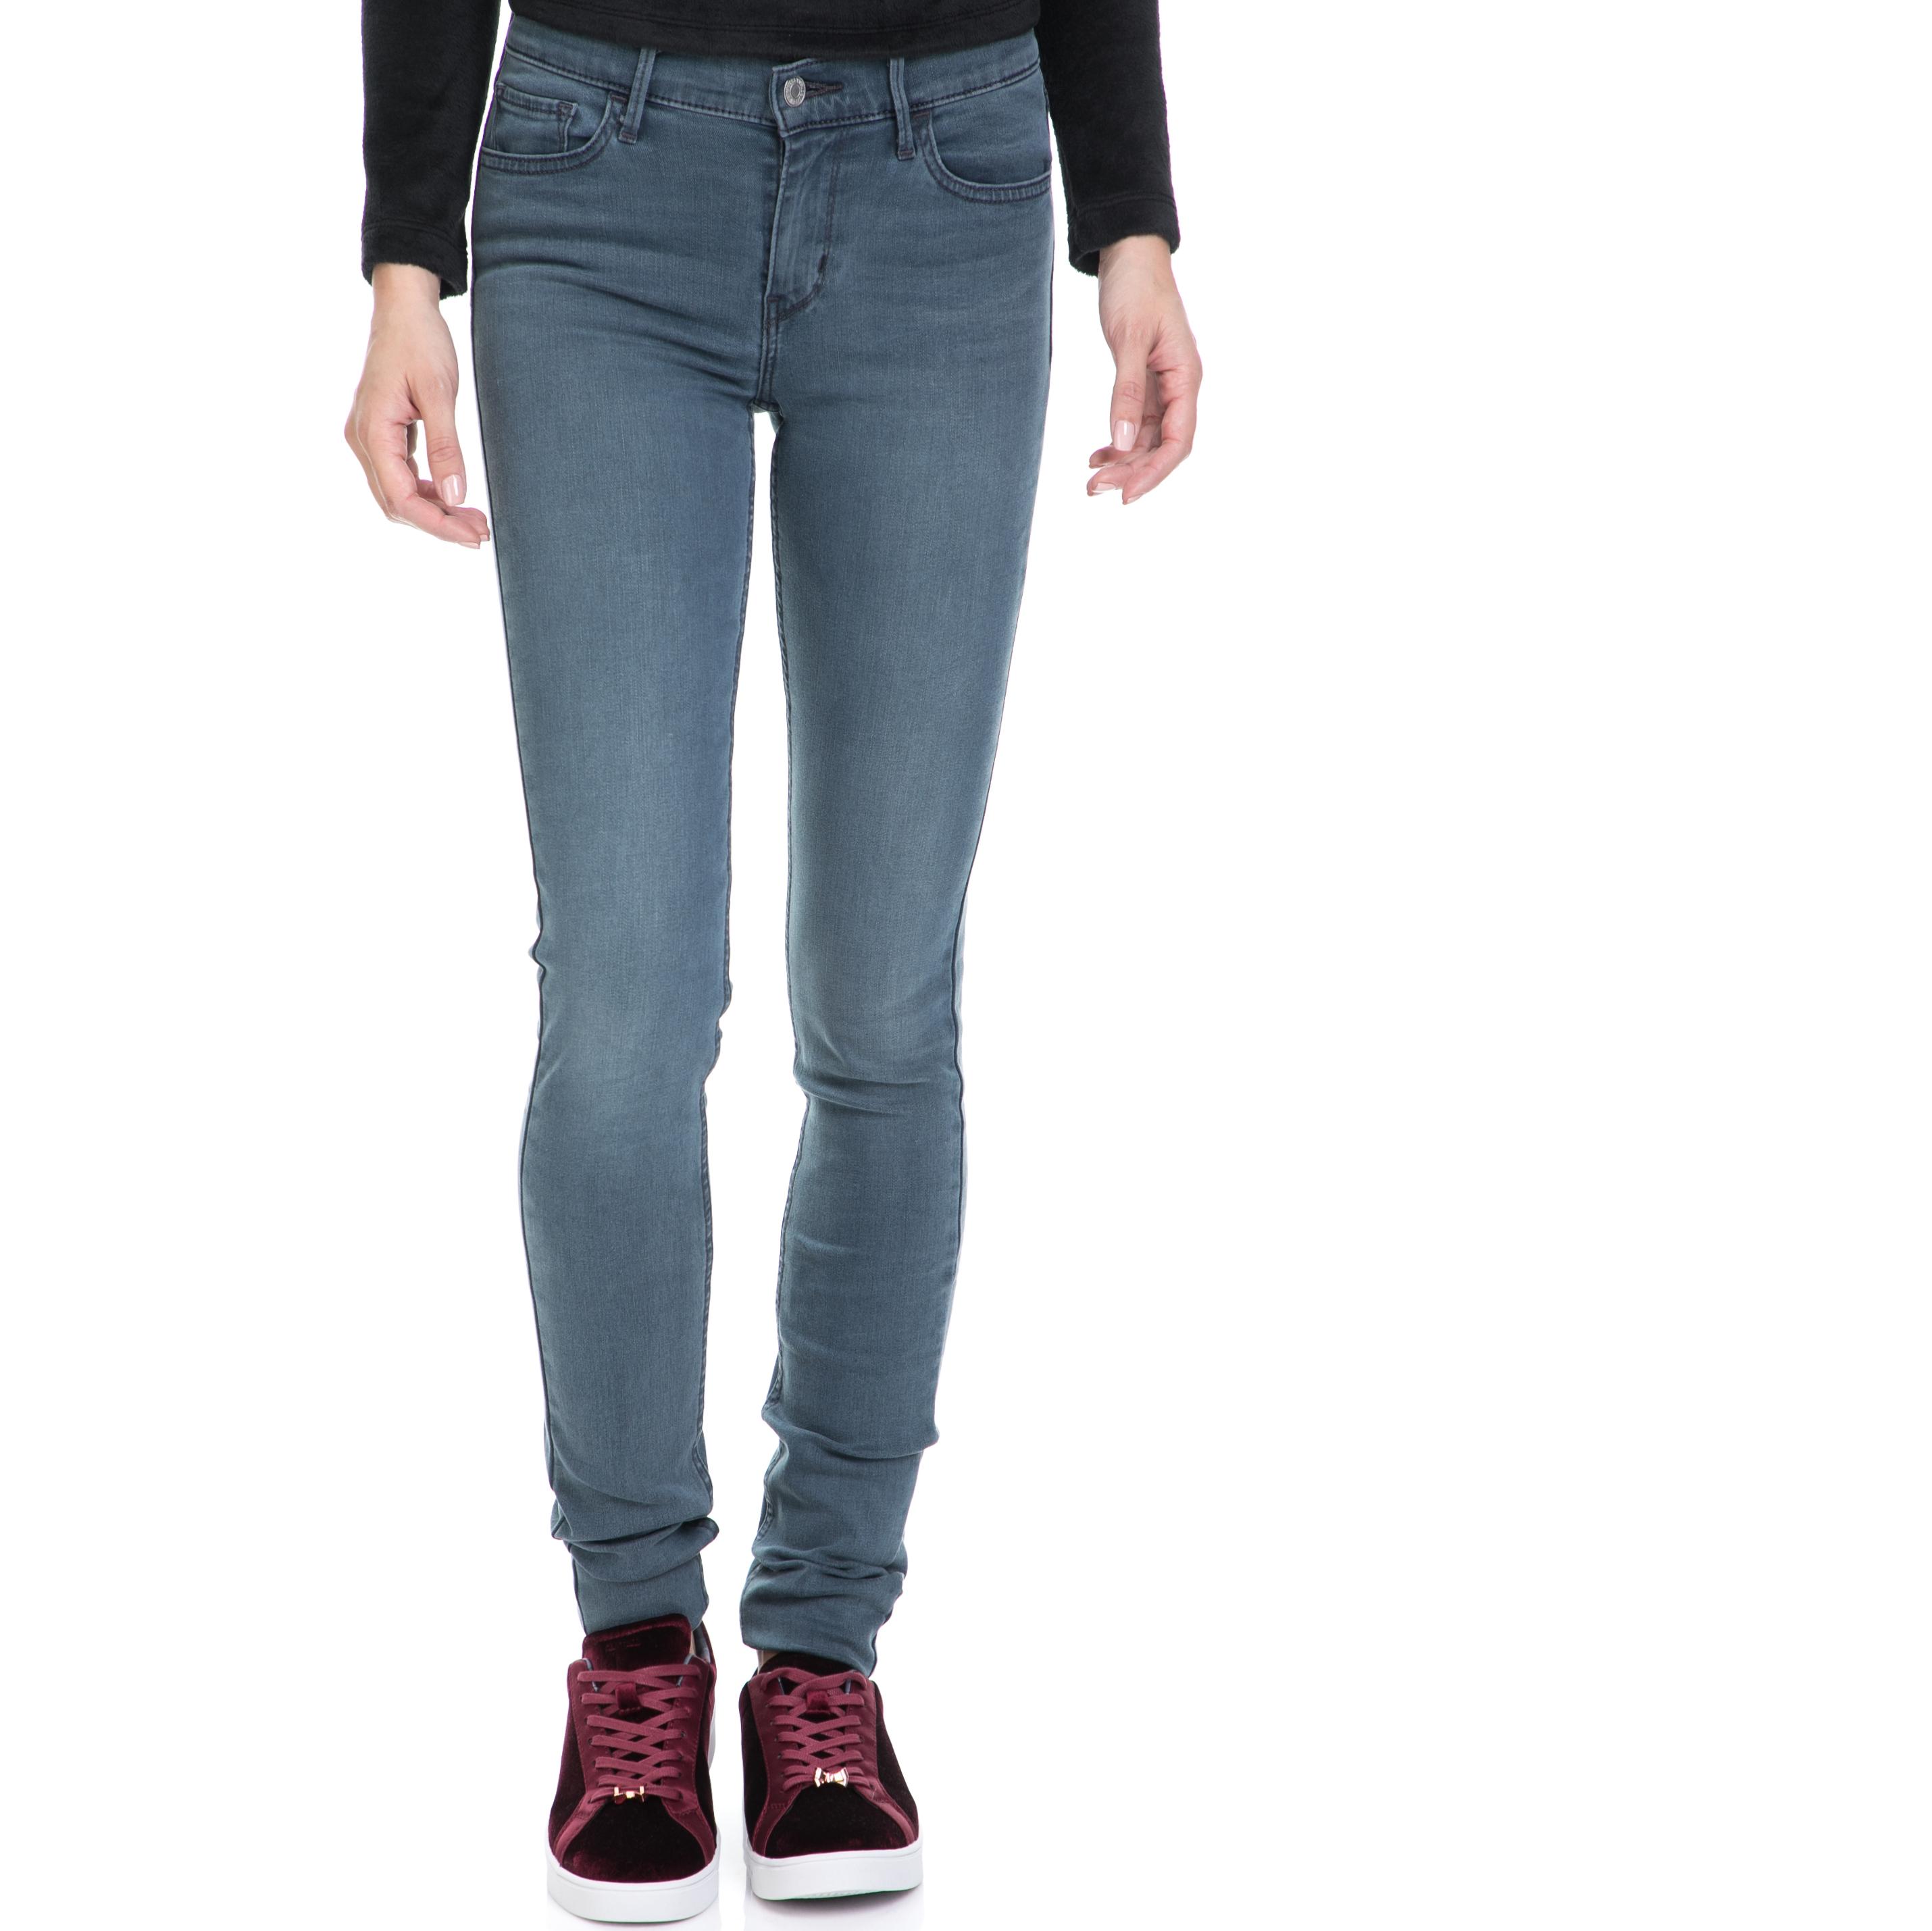 LEVI'S - Γυναικείο τζιν παντελόνι INNOVATION SUPER SKINNY LEVI'S μπλε